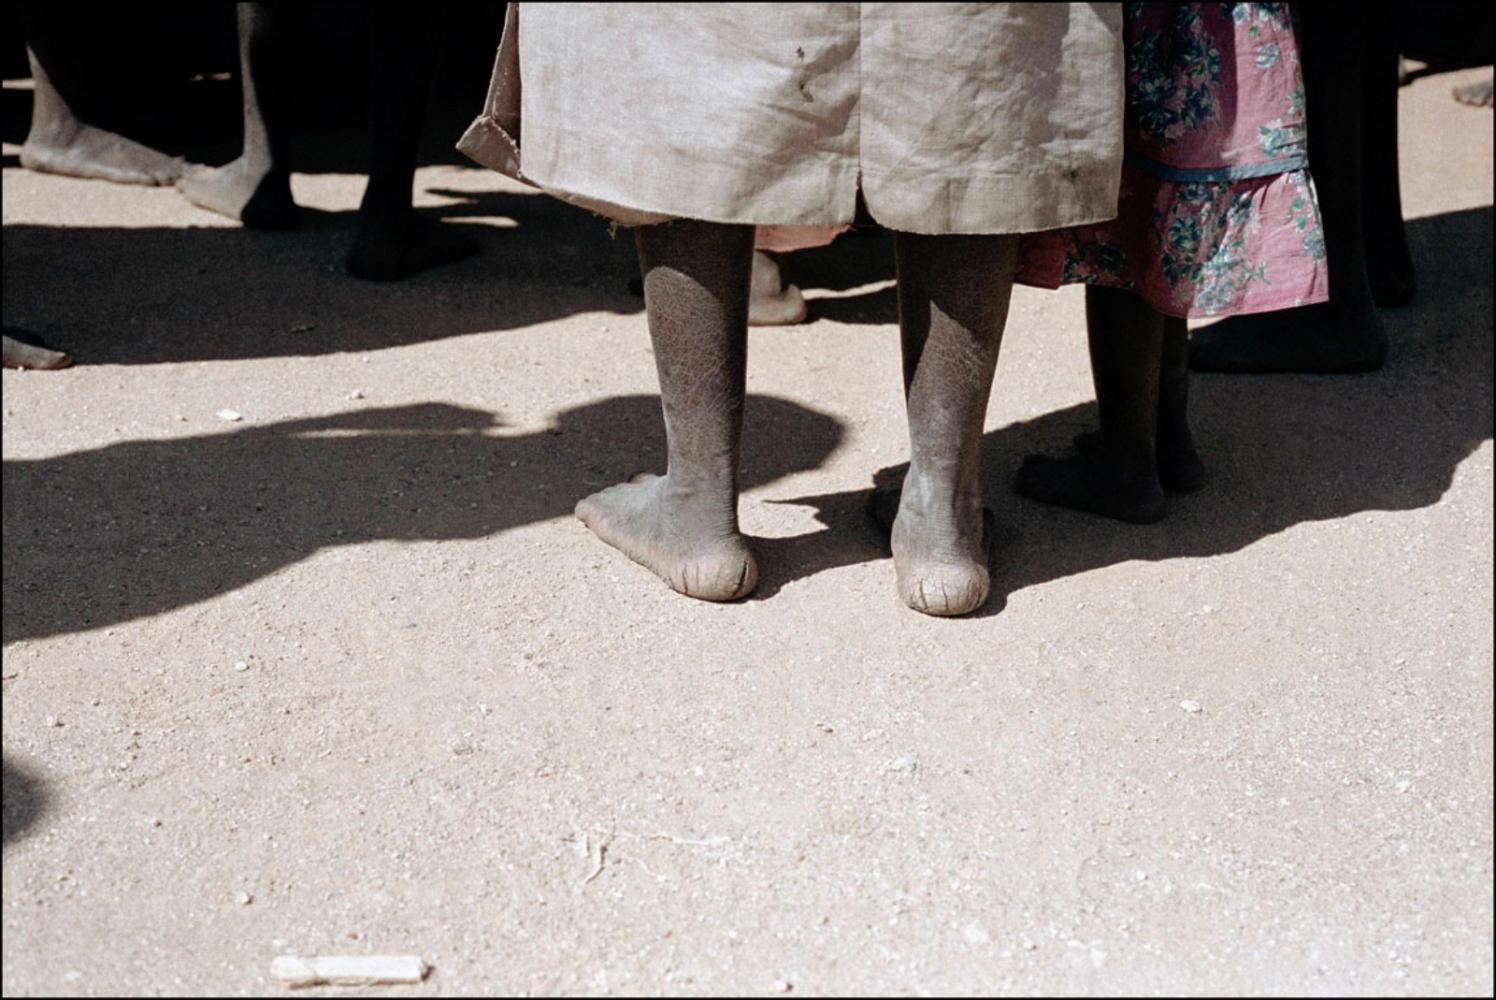 Feet, Cuando, Angola, July 2000